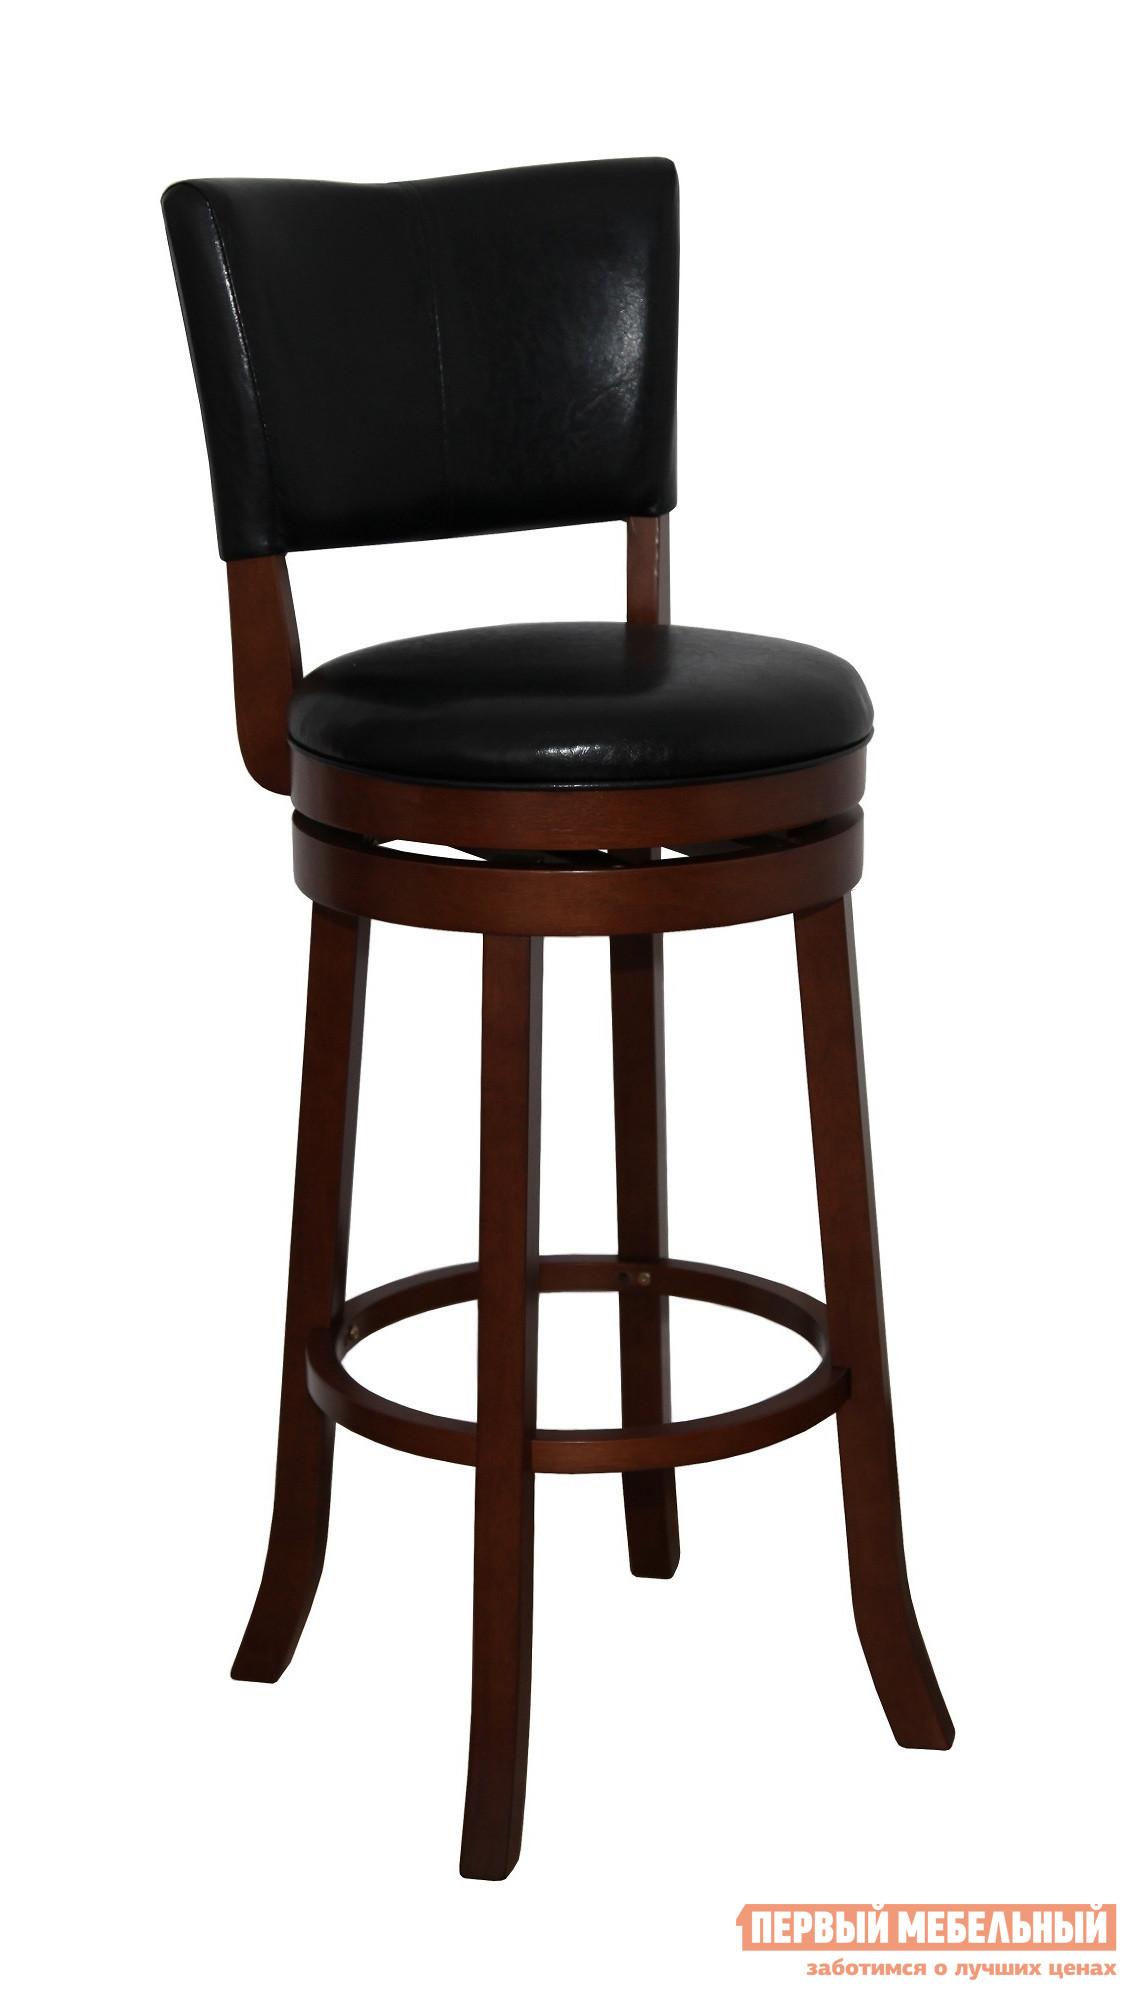 Барный стул Red and Black 9090 Шоколад